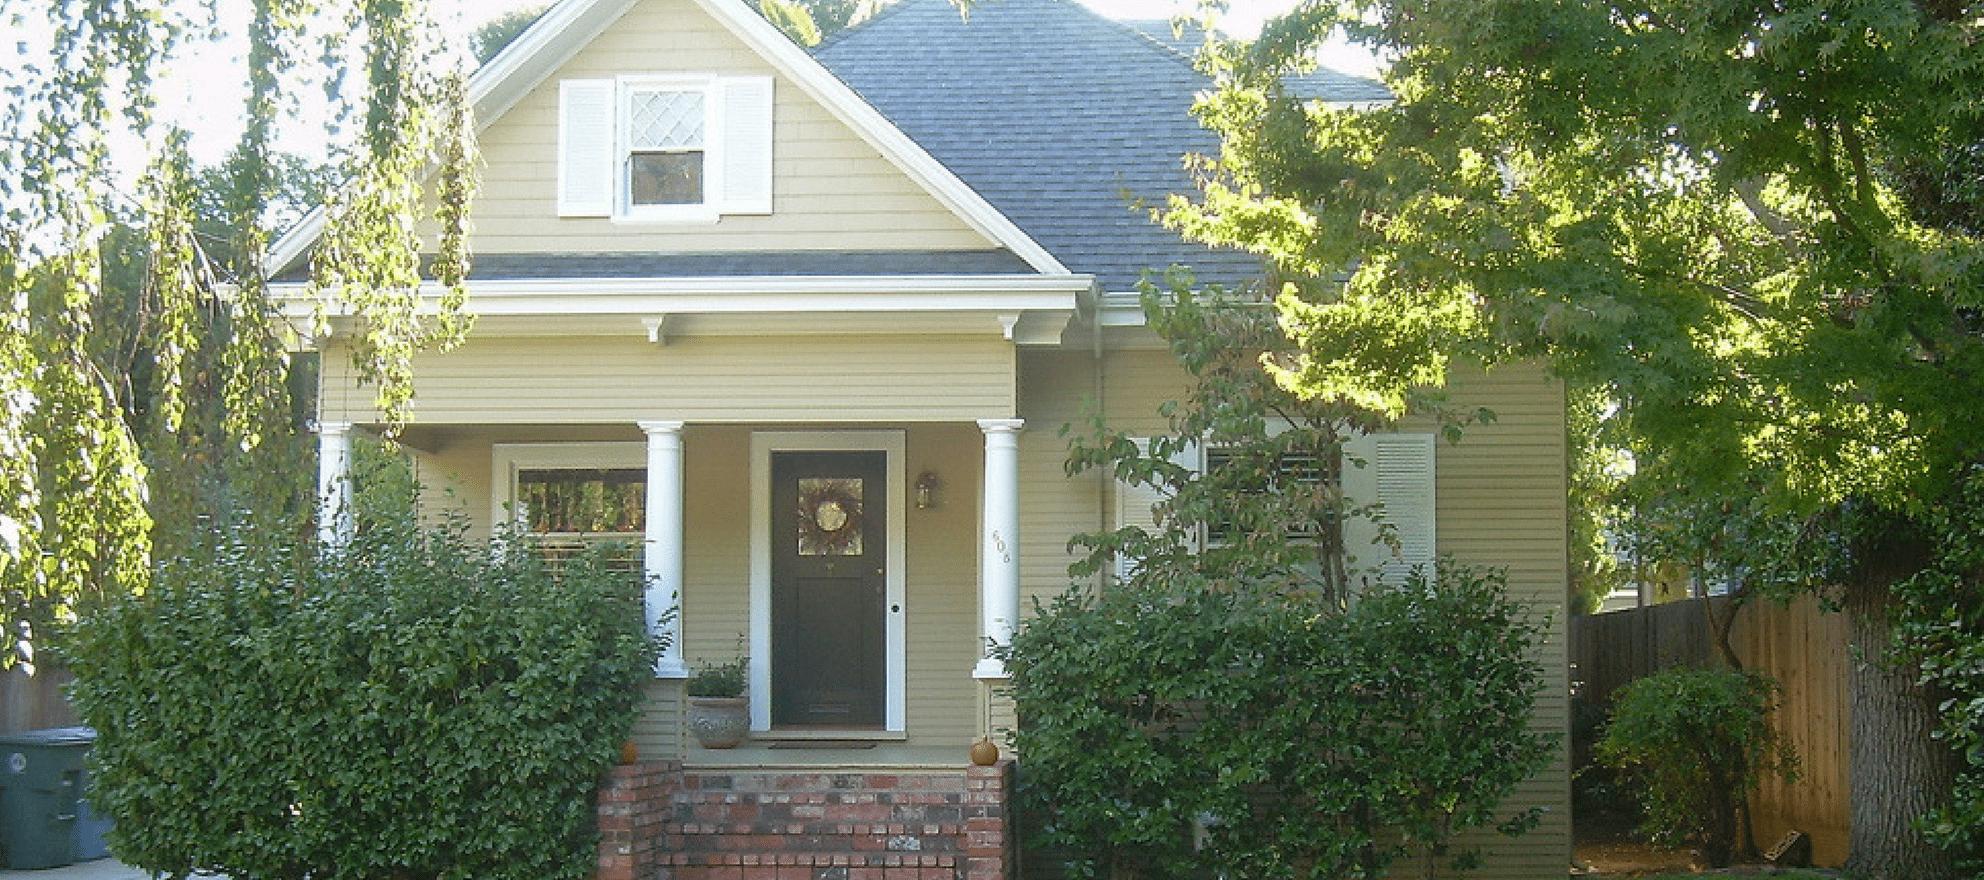 Generation Z homebuyers